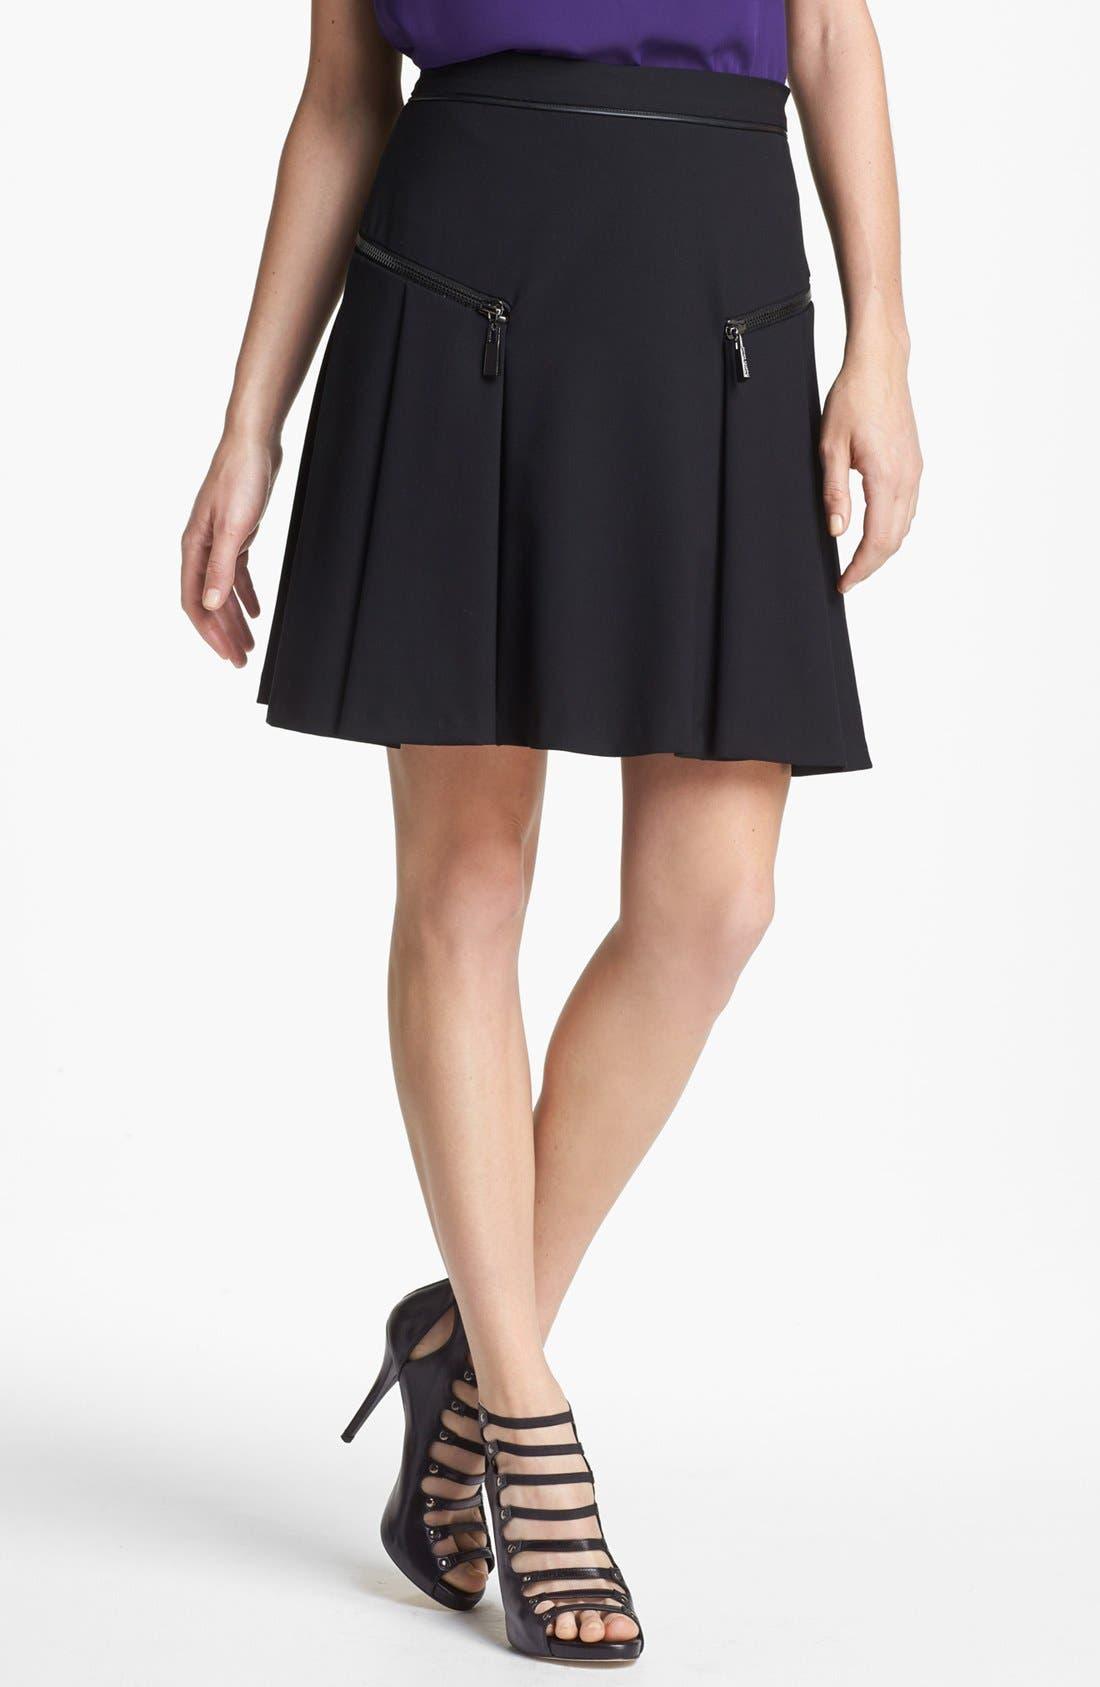 Alternate Image 1 Selected - Vince Camuto Zip Trim Skirt